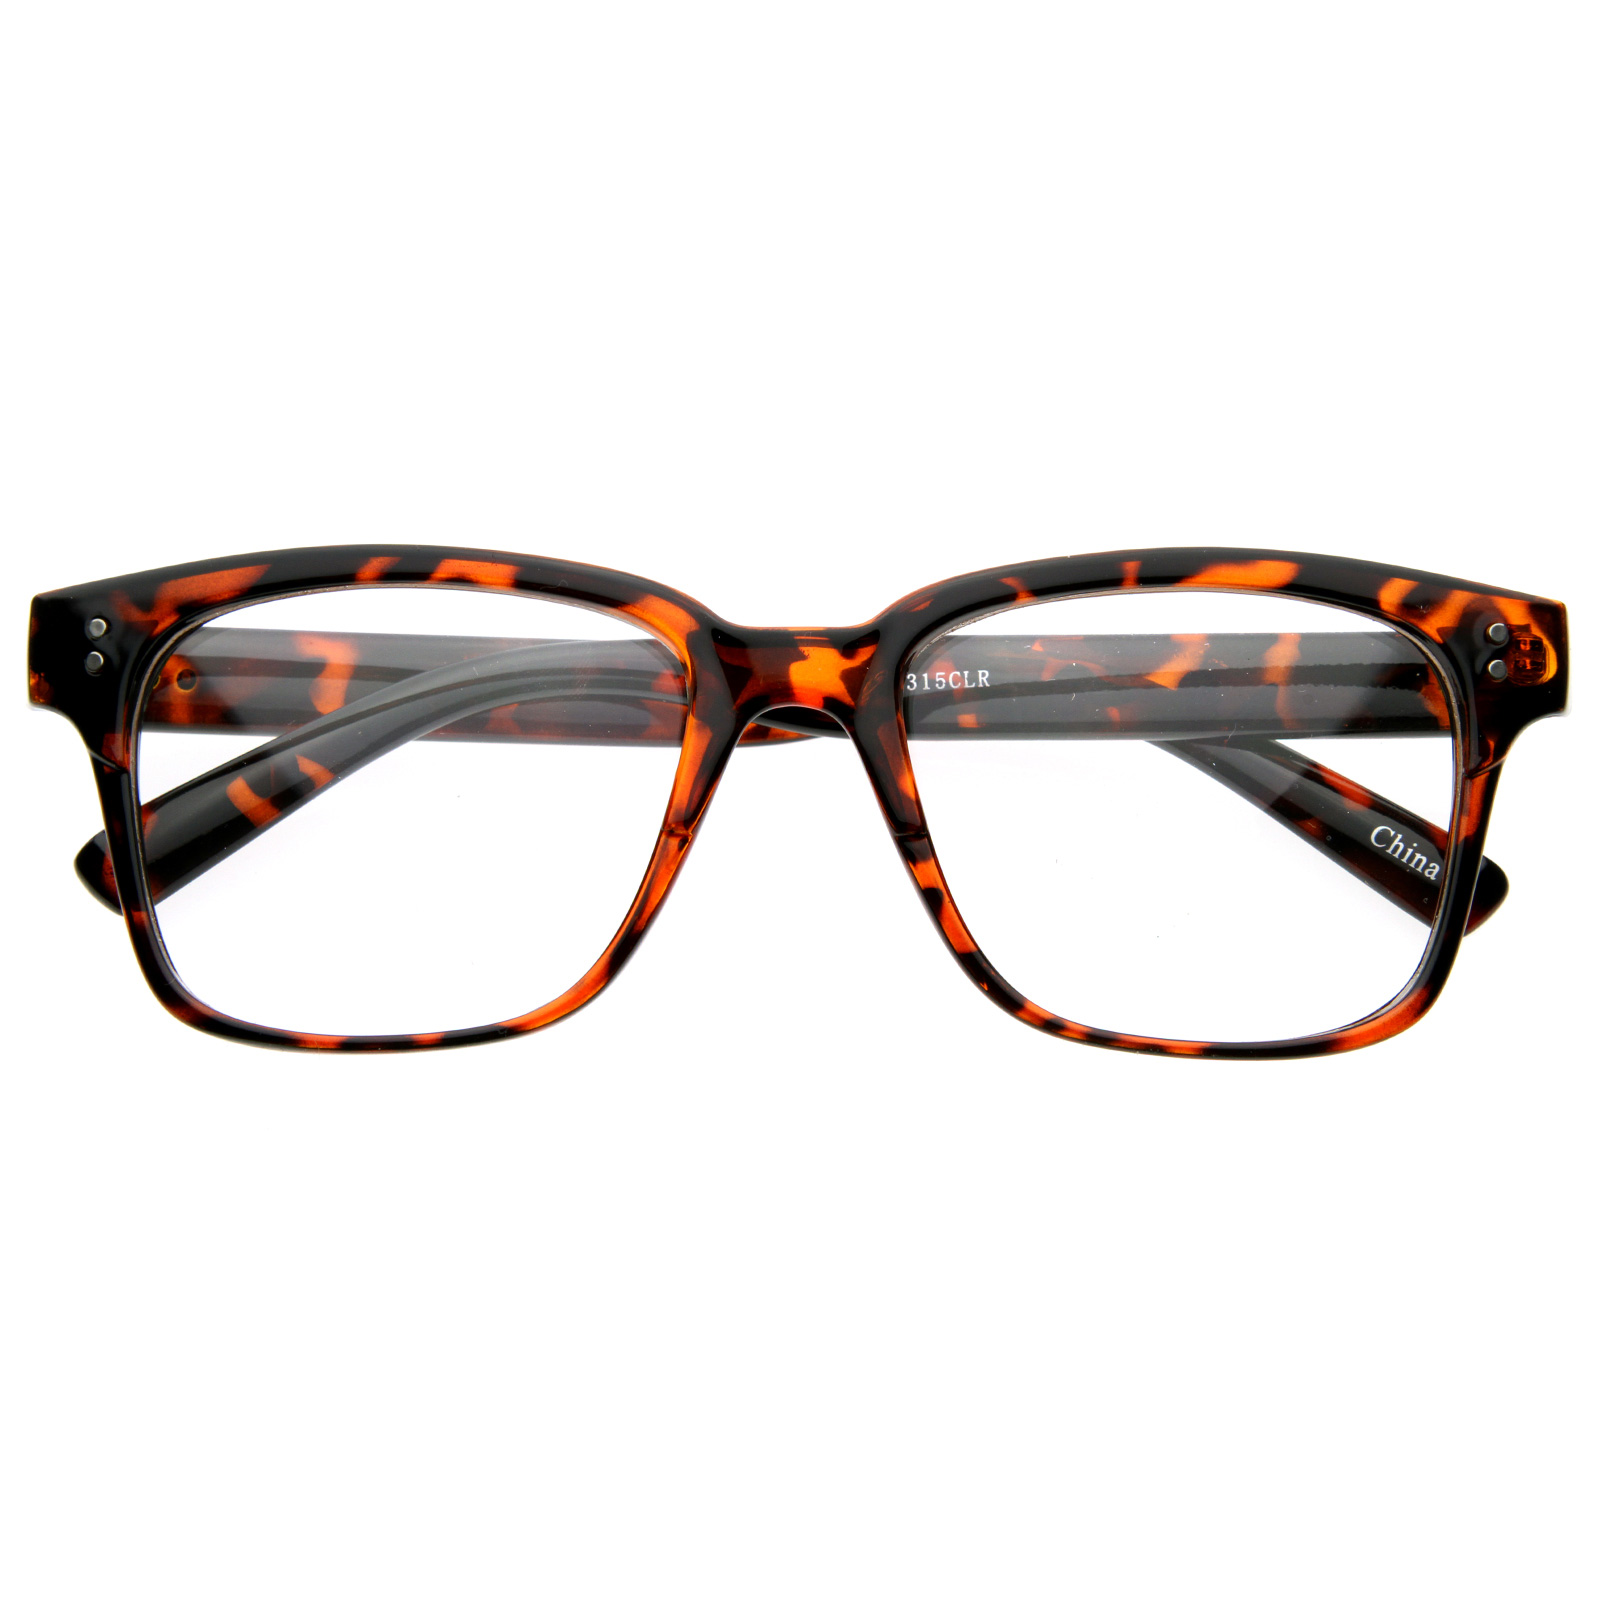 New-Vintage-Fashion-Nerd-Clear-Lens-UV400-Horned-Rim-Shades-Style-Glasses-8158